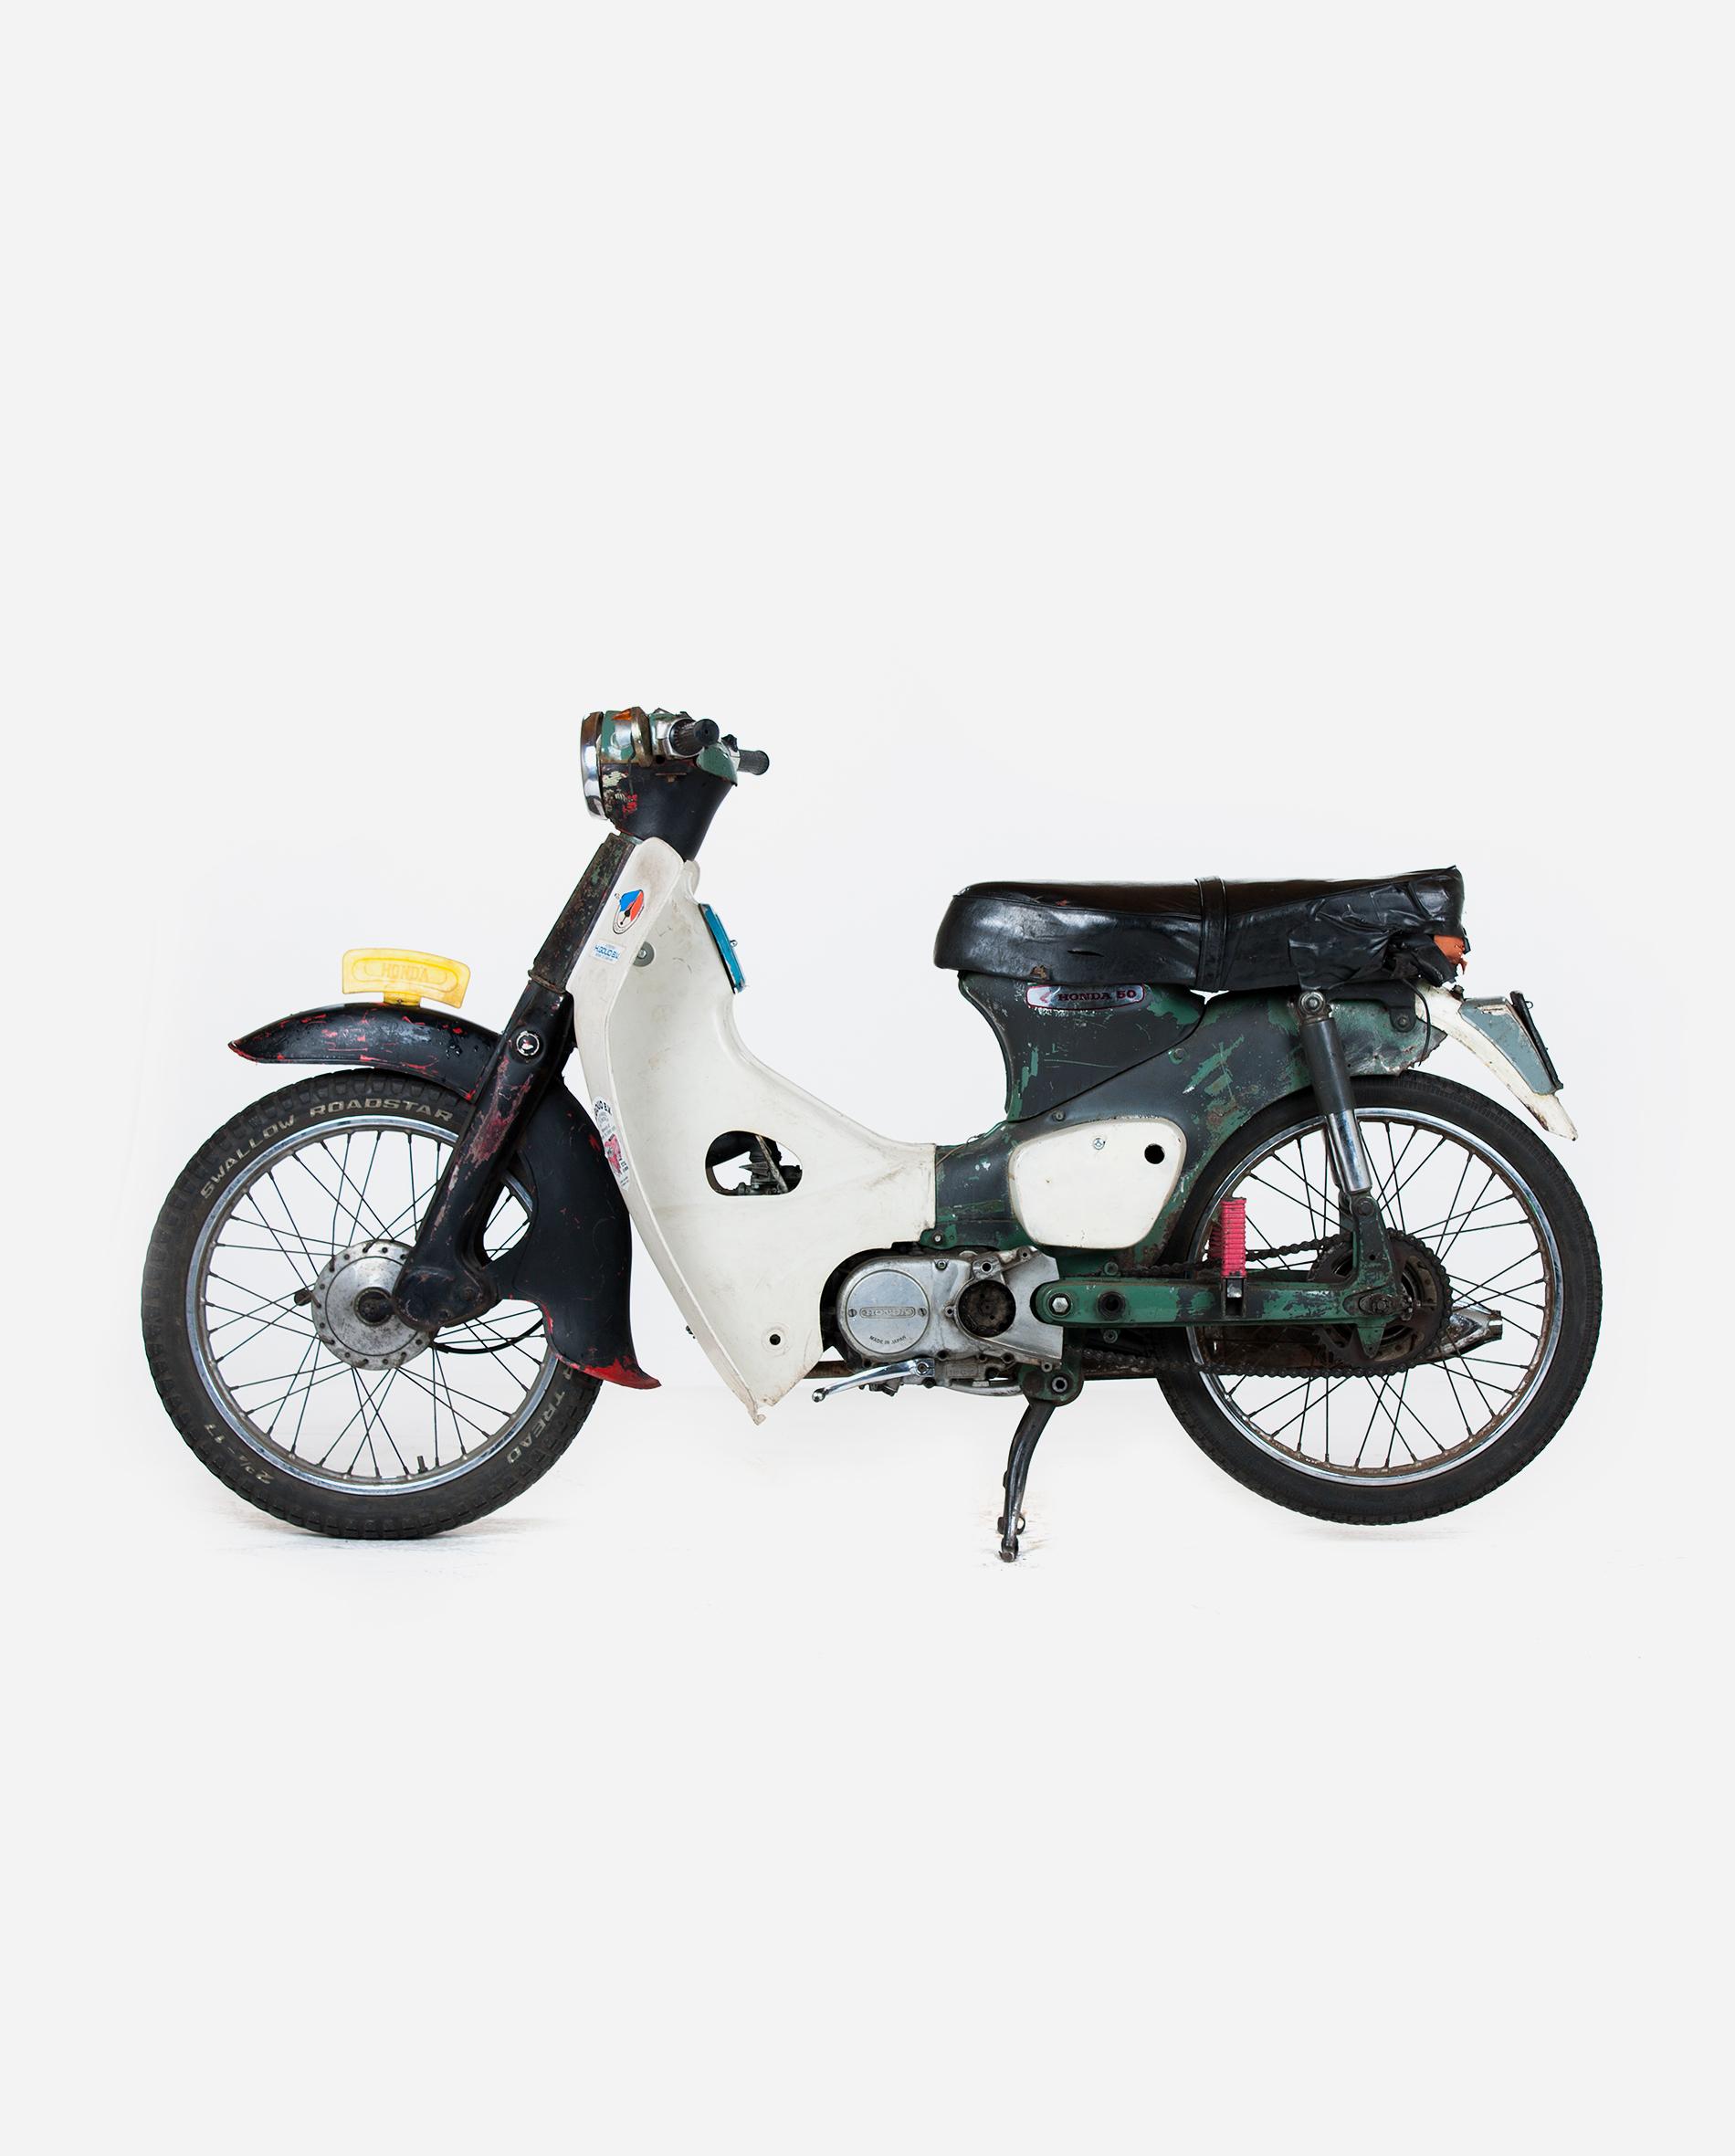 Honda-c50-zwart-l · Fourstrokebarn